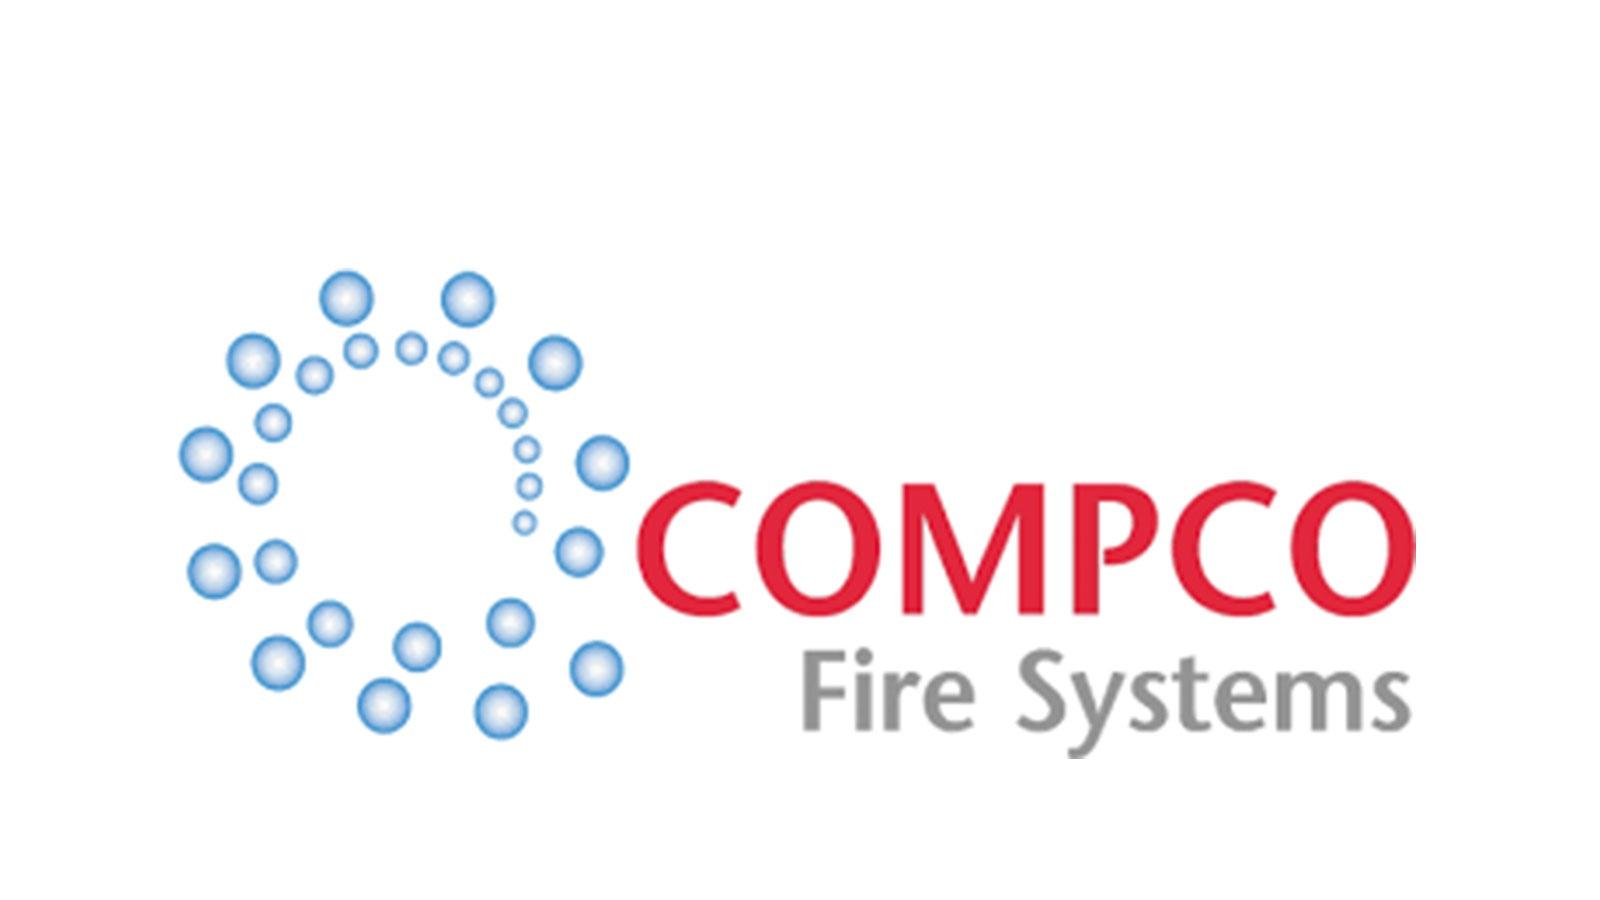 Compco chooses Asite